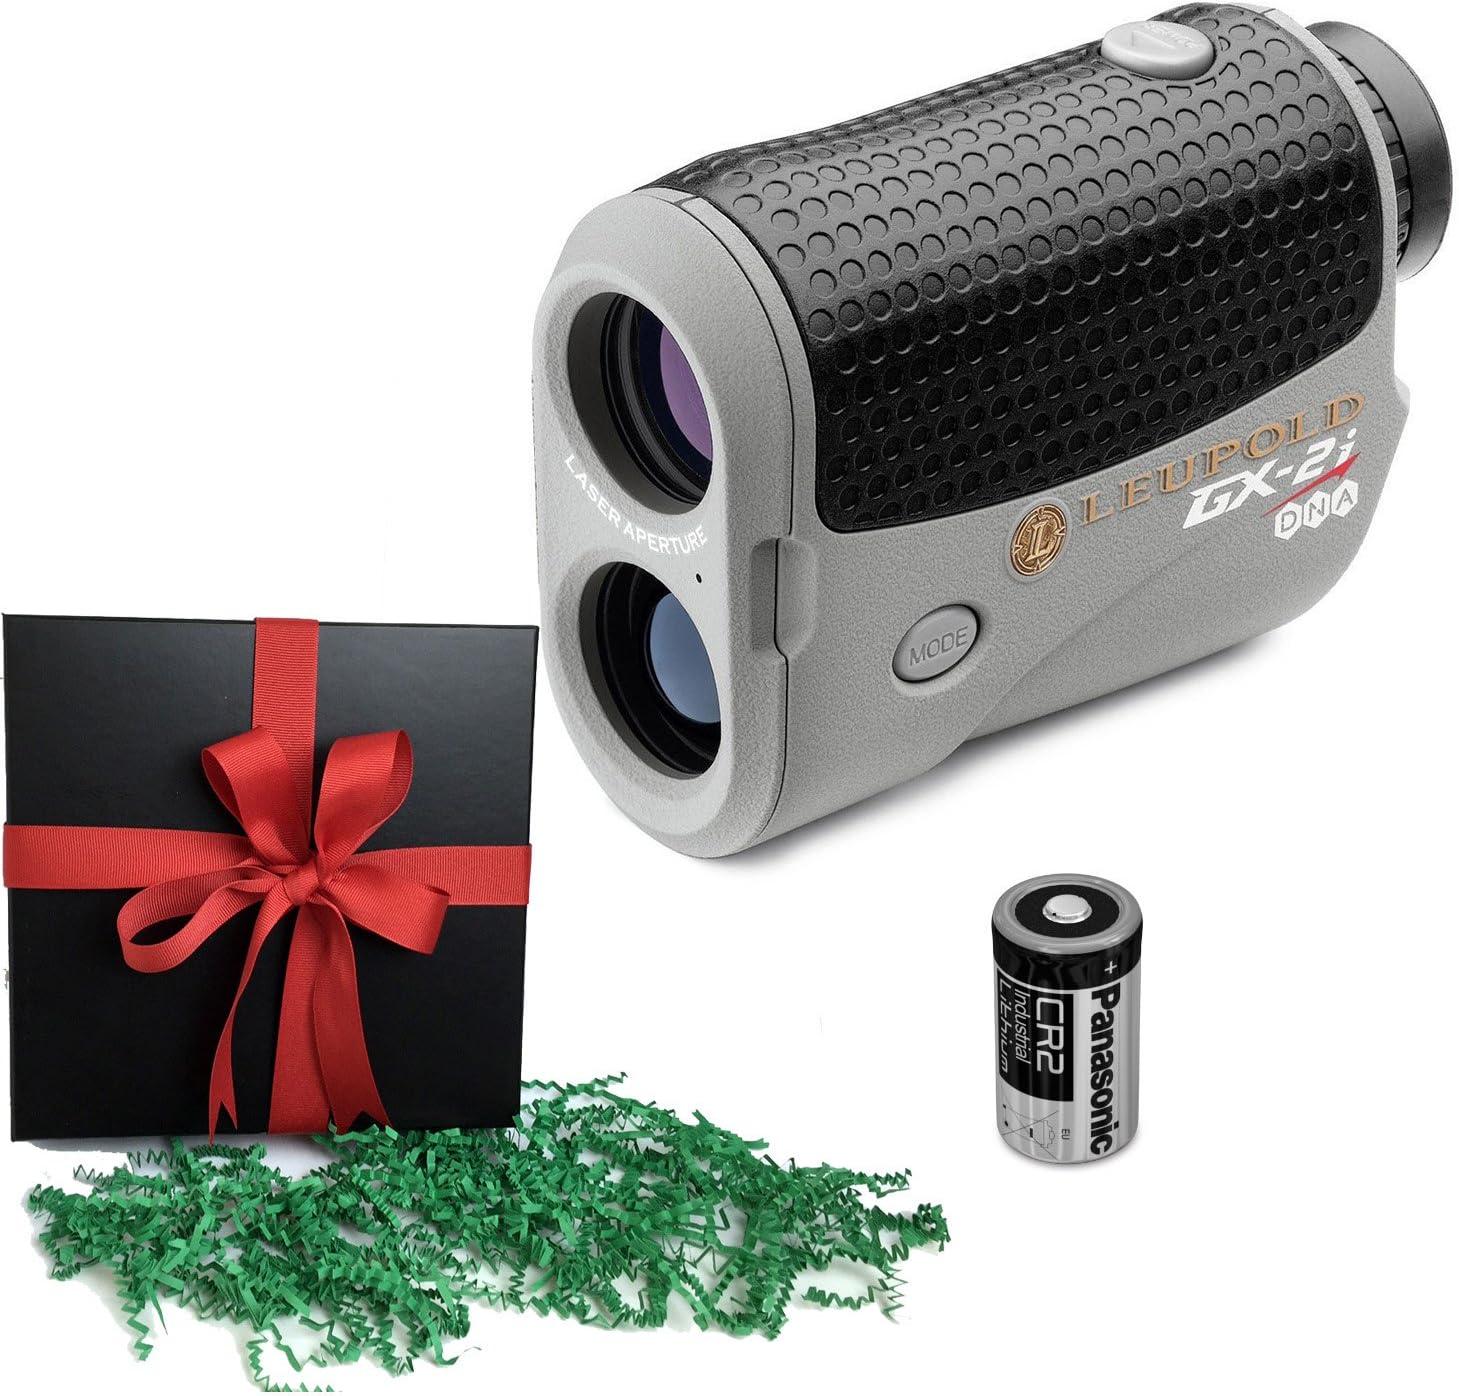 Leupold Golf Laser Rangefinder Pin2, 2i2, 2i3, 3i2, 4i2,Gift Box, Packed and Ready